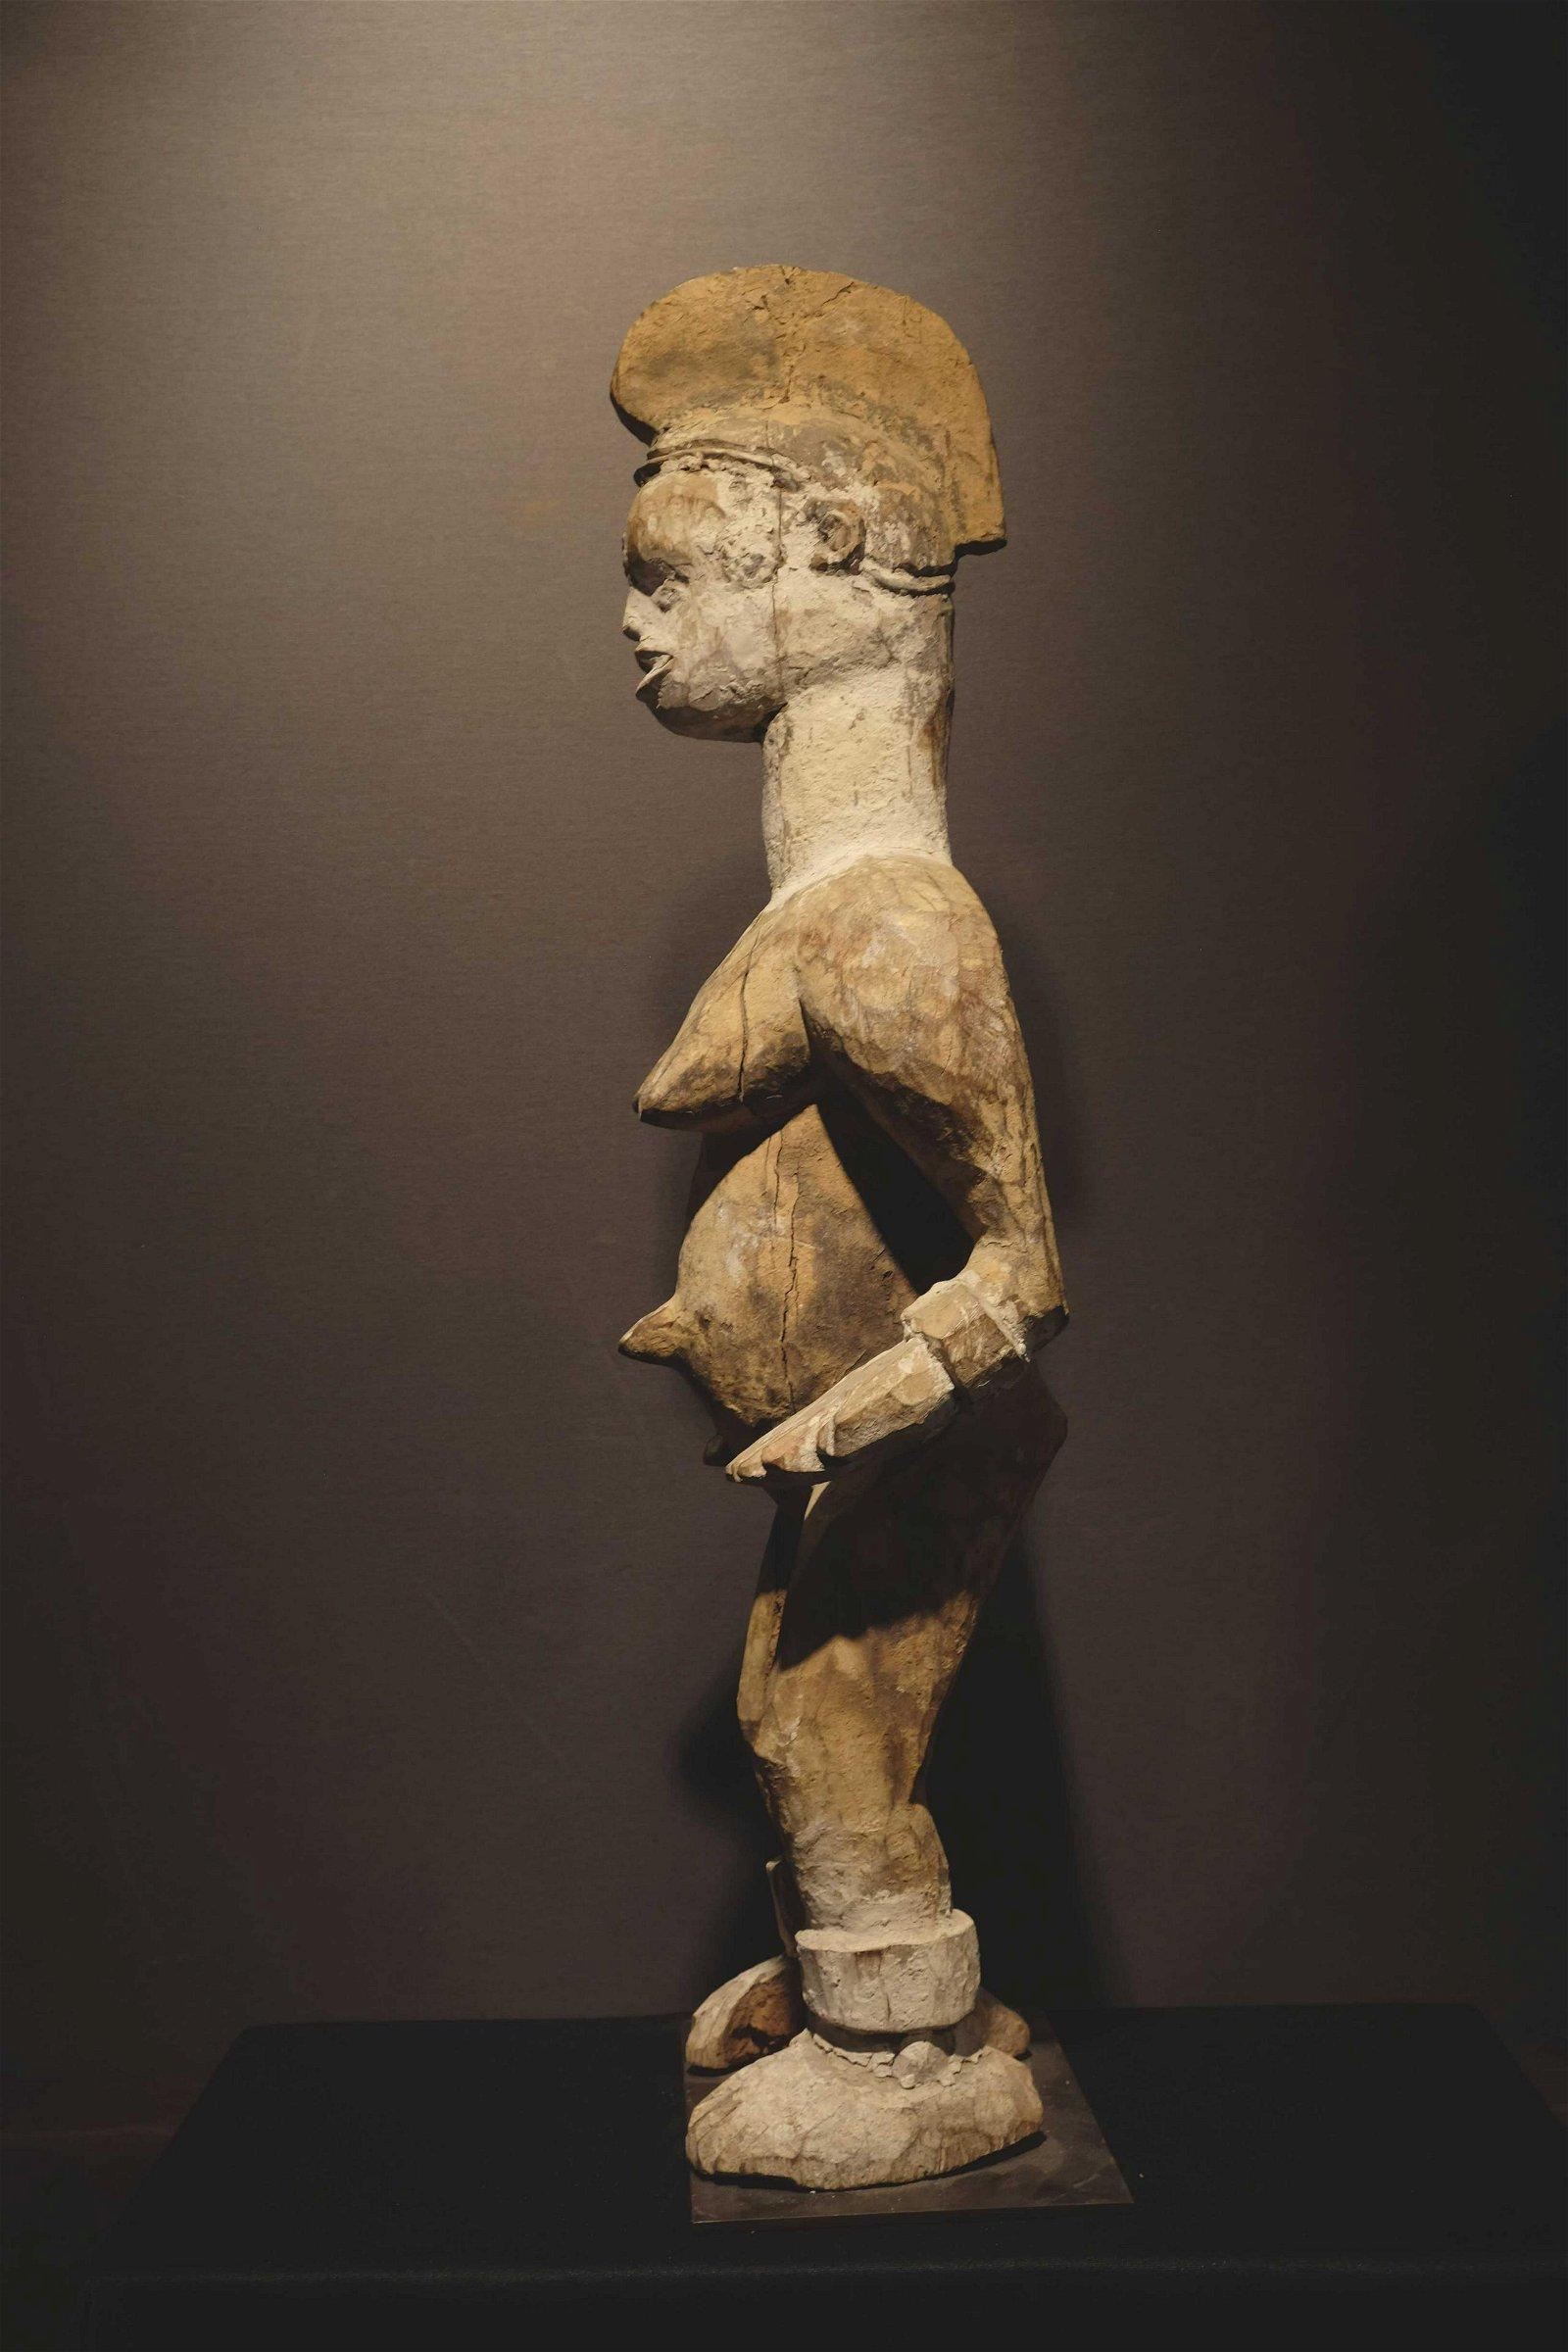 Ibo female figure NigeriaProv: Taitt collection